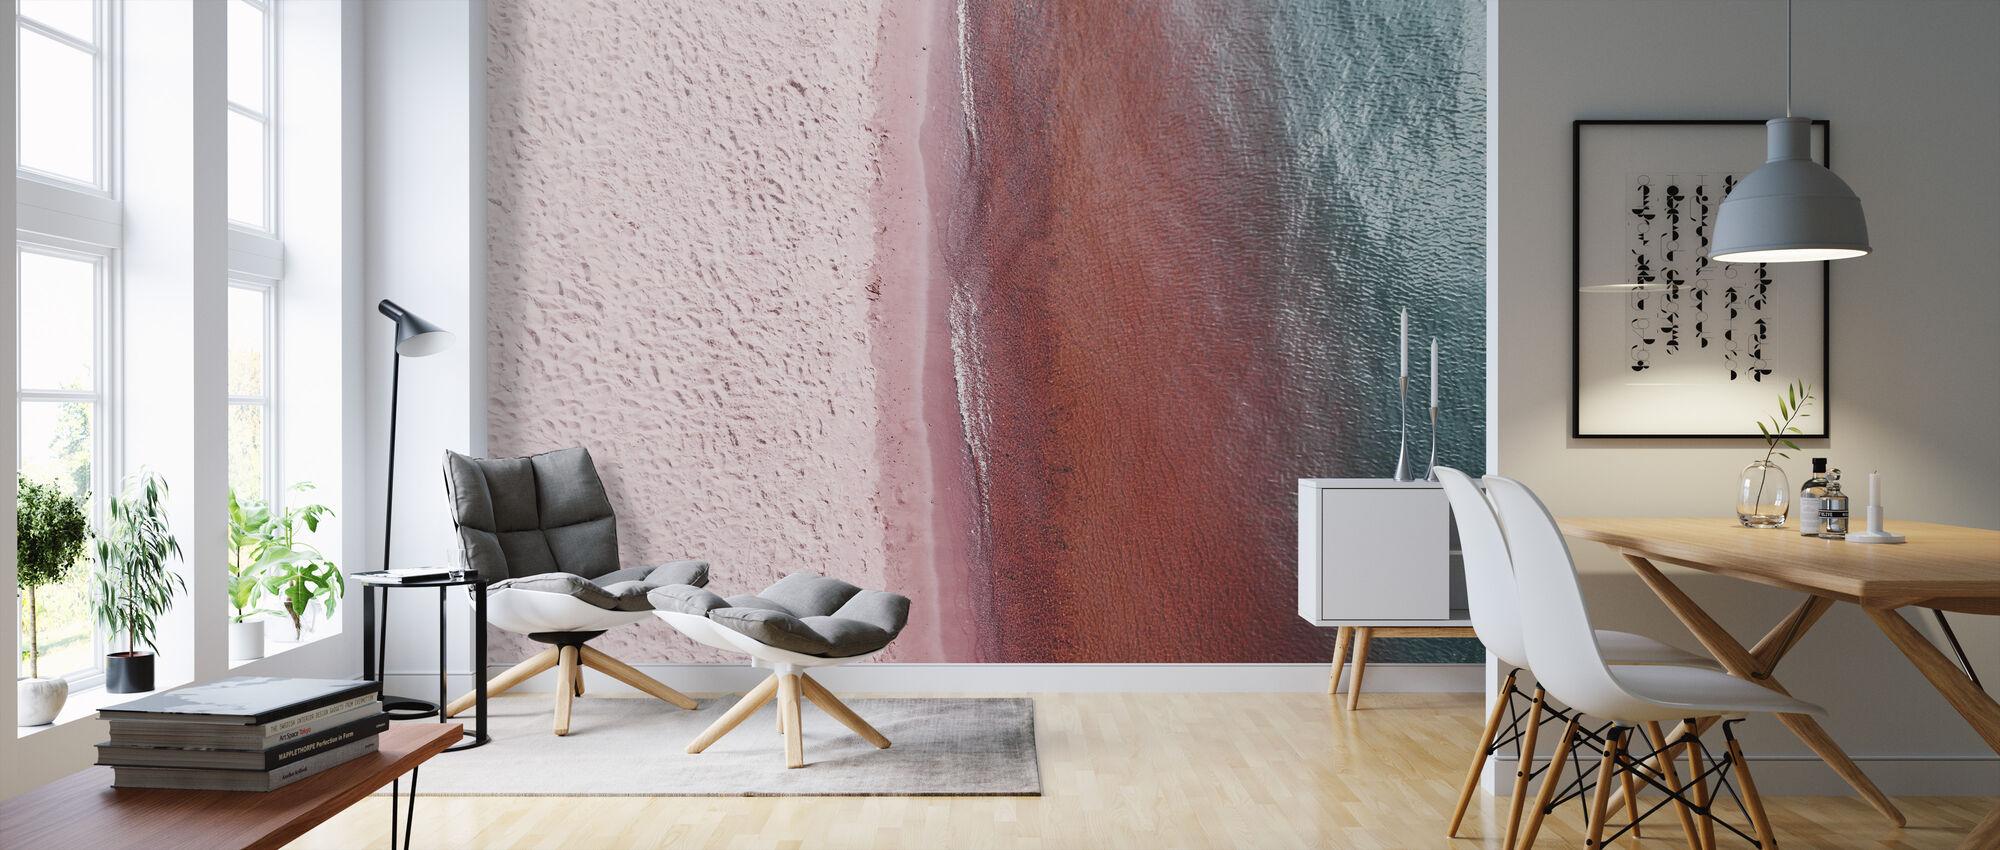 Pink Earth - Wallpaper - Living Room